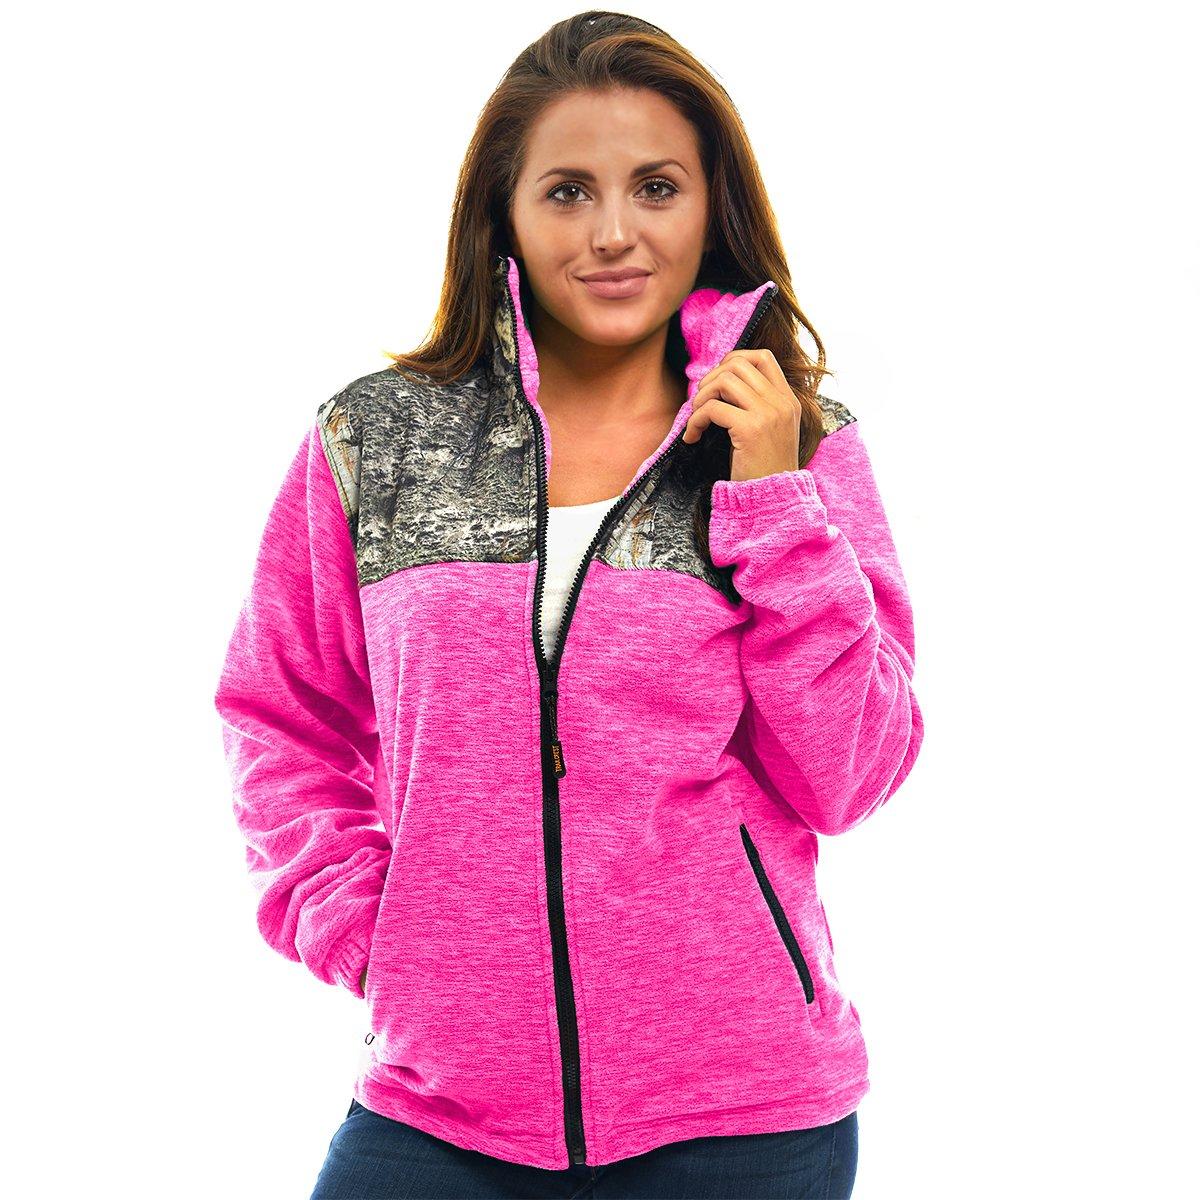 TrailCrest Women's C-Max Full Zip Fleece Jacket, Mossy Oak Mountain Country Camo (Pink Heather - Large)